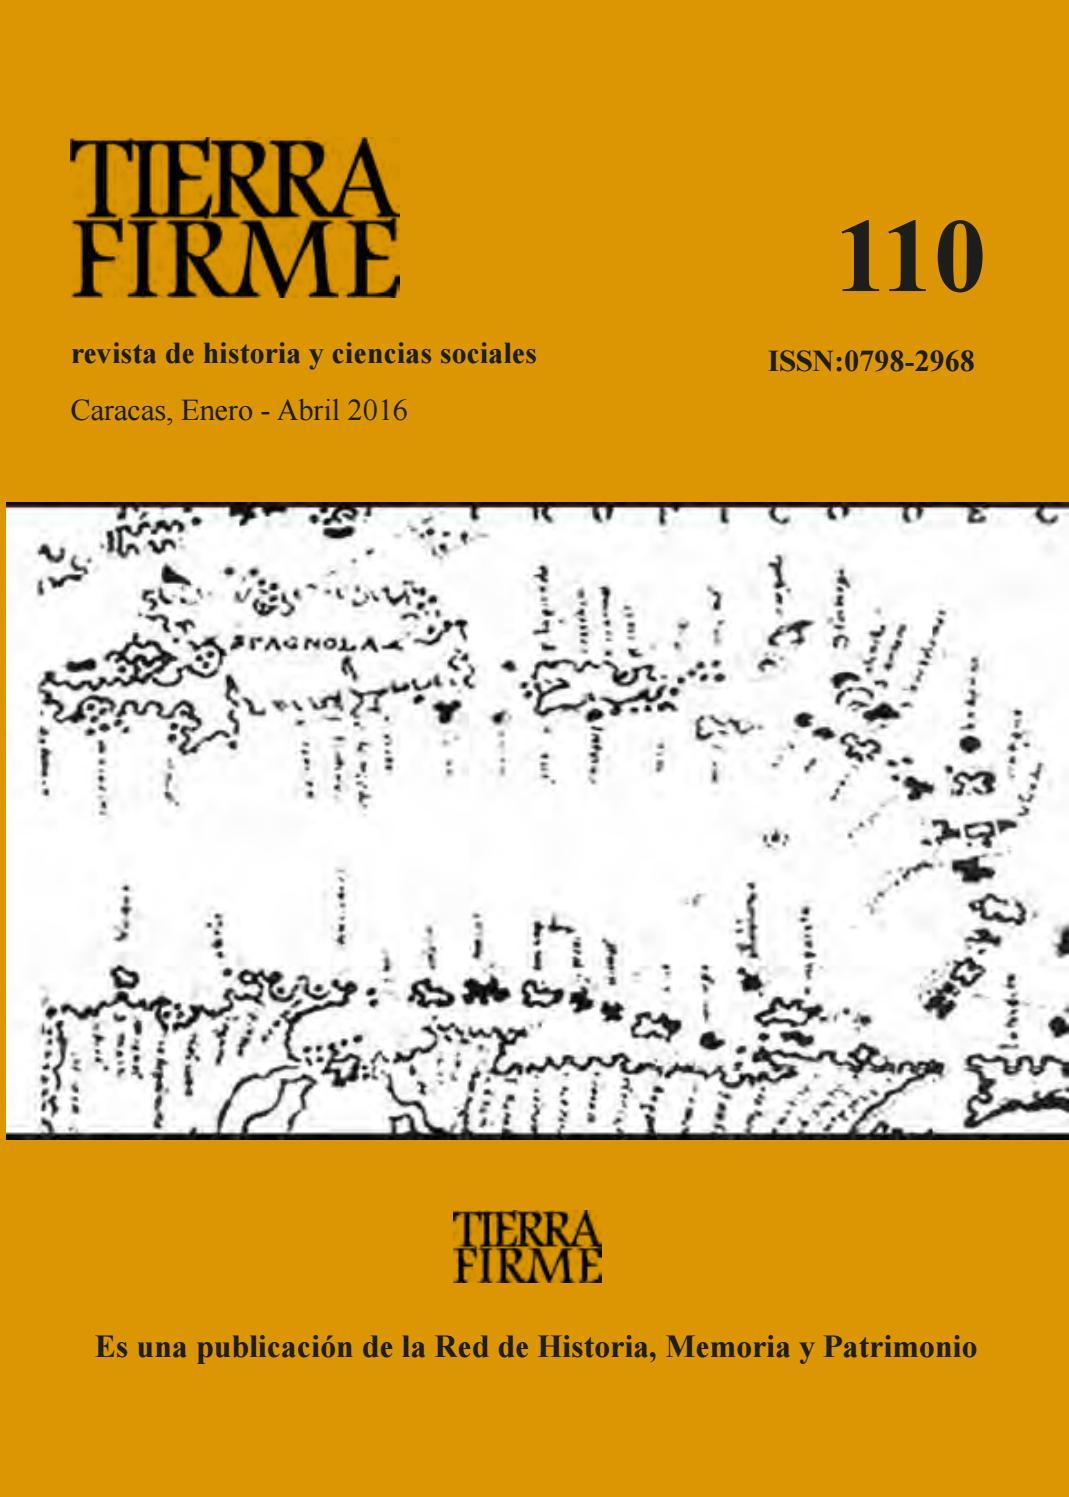 Revista Tierra Firme 110 by Tierra Firme - Revista - issuu